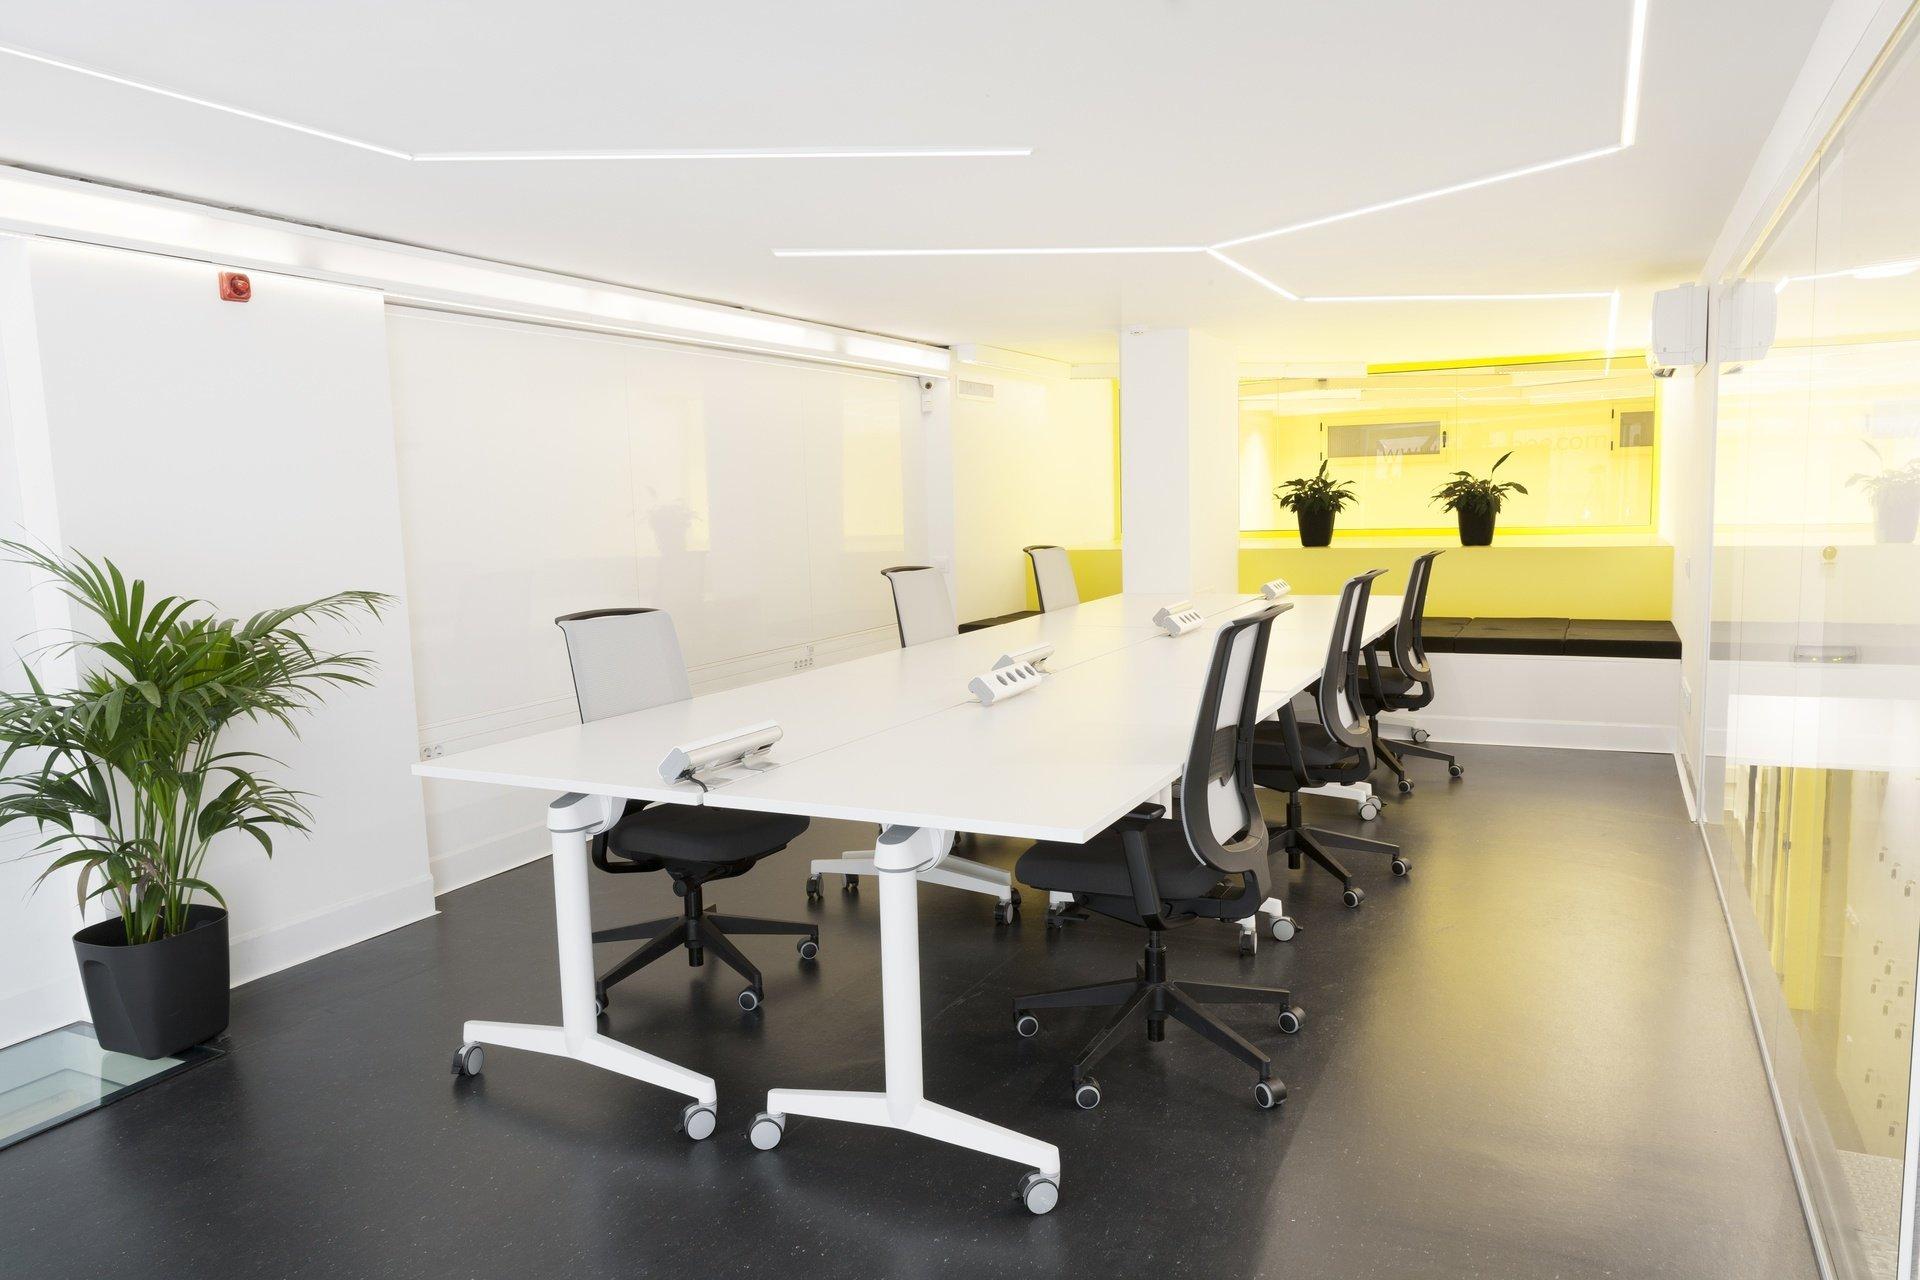 Barcelone workshop spaces Espace de Coworking Start2bee Escorial Workshoproom image 0